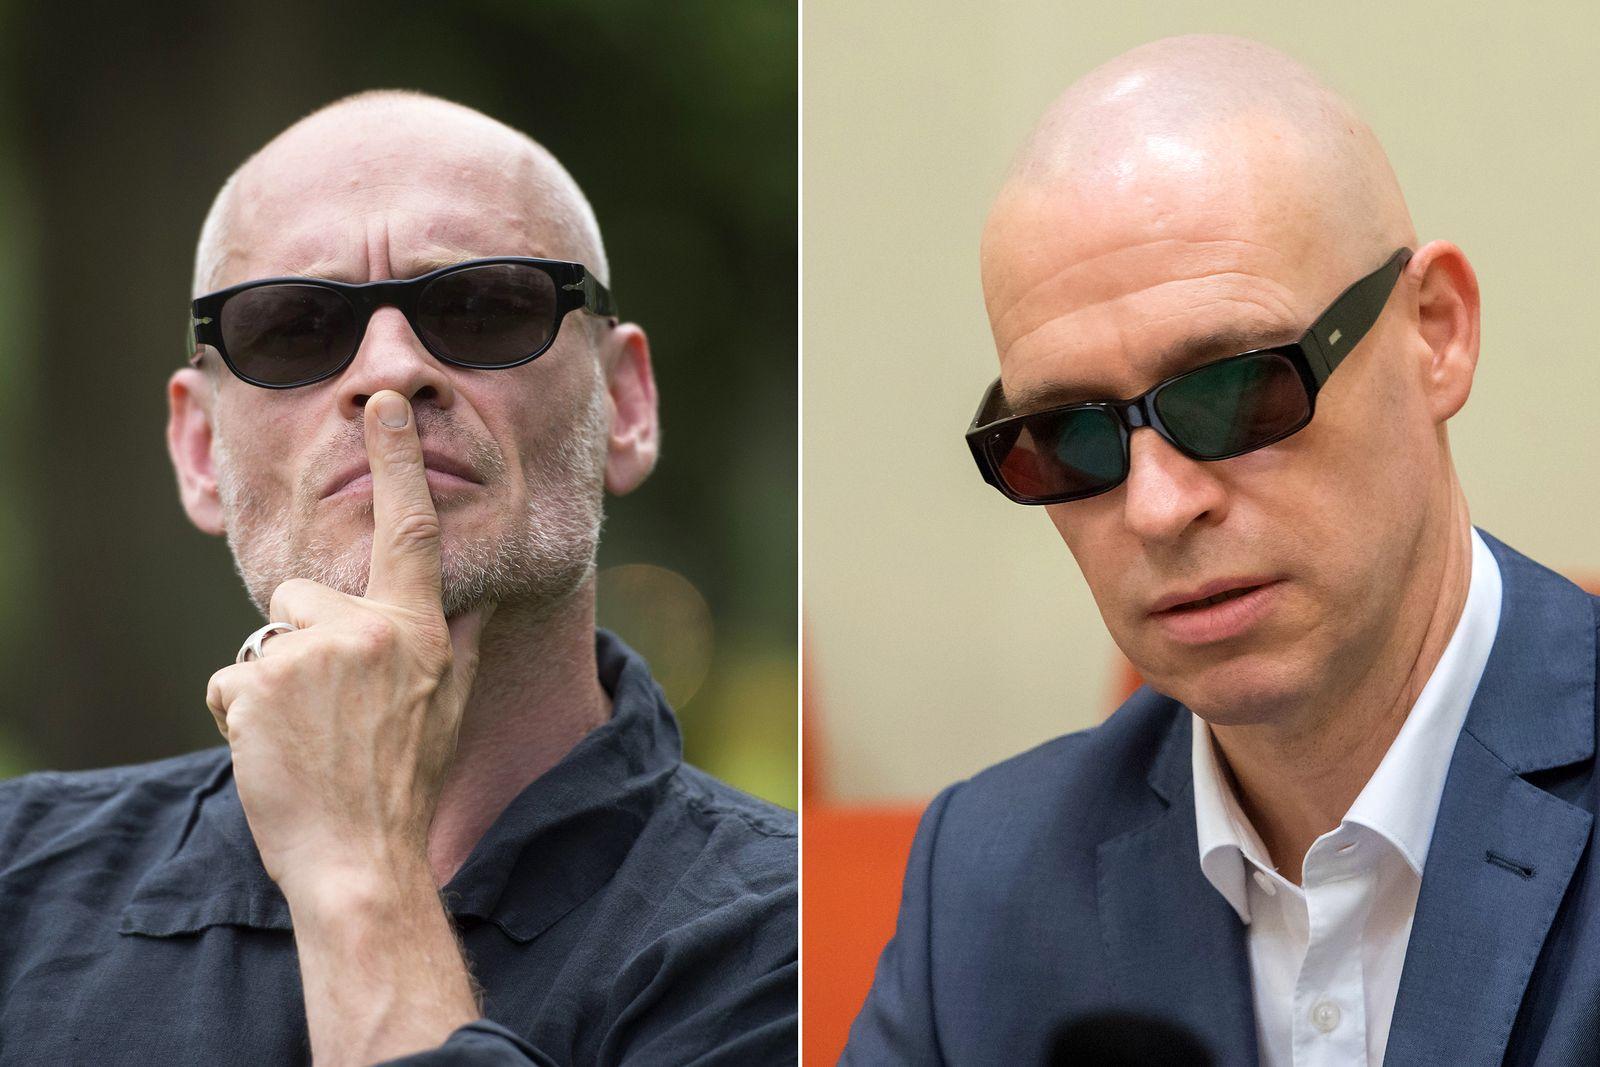 EINMALIGE VERWENDUNG Johannes Krisch/ Olaf Klemke KOMBO